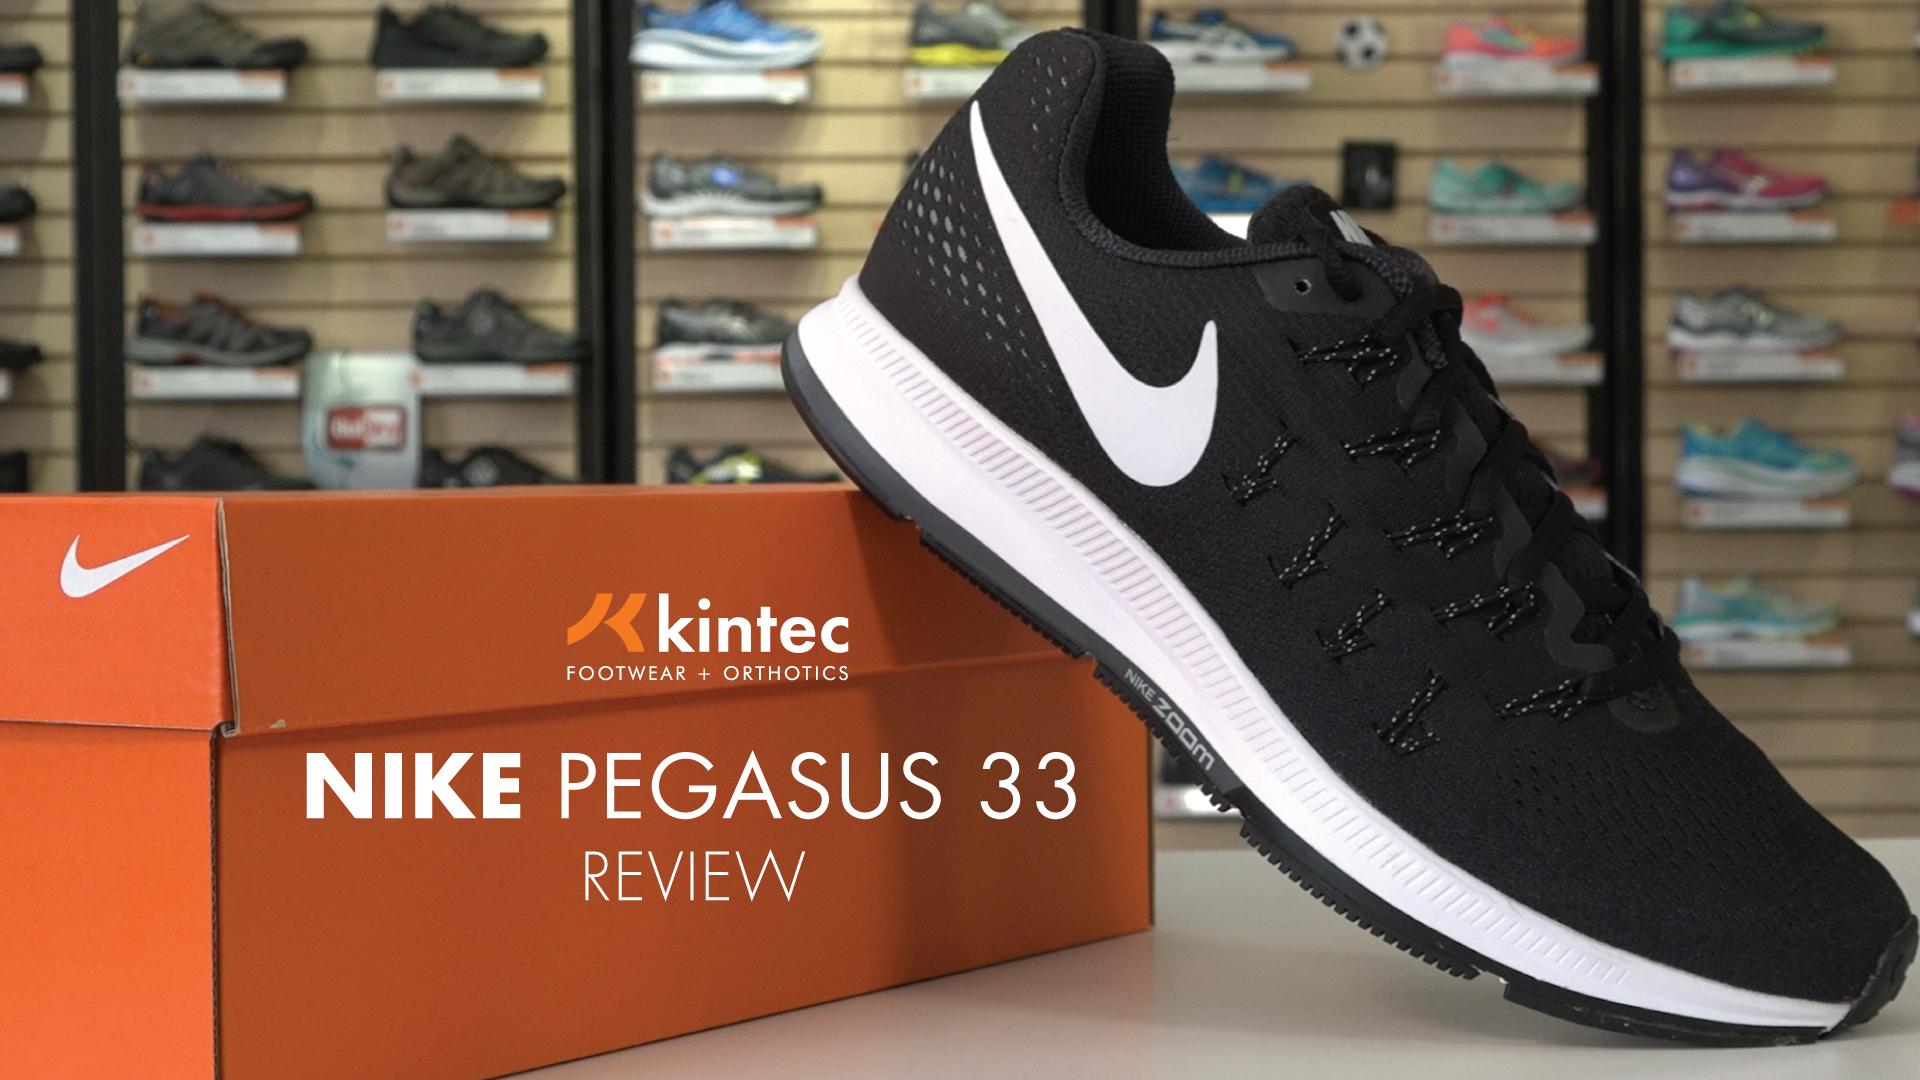 Nike Pegasus 33 Shoe Review | Kintec